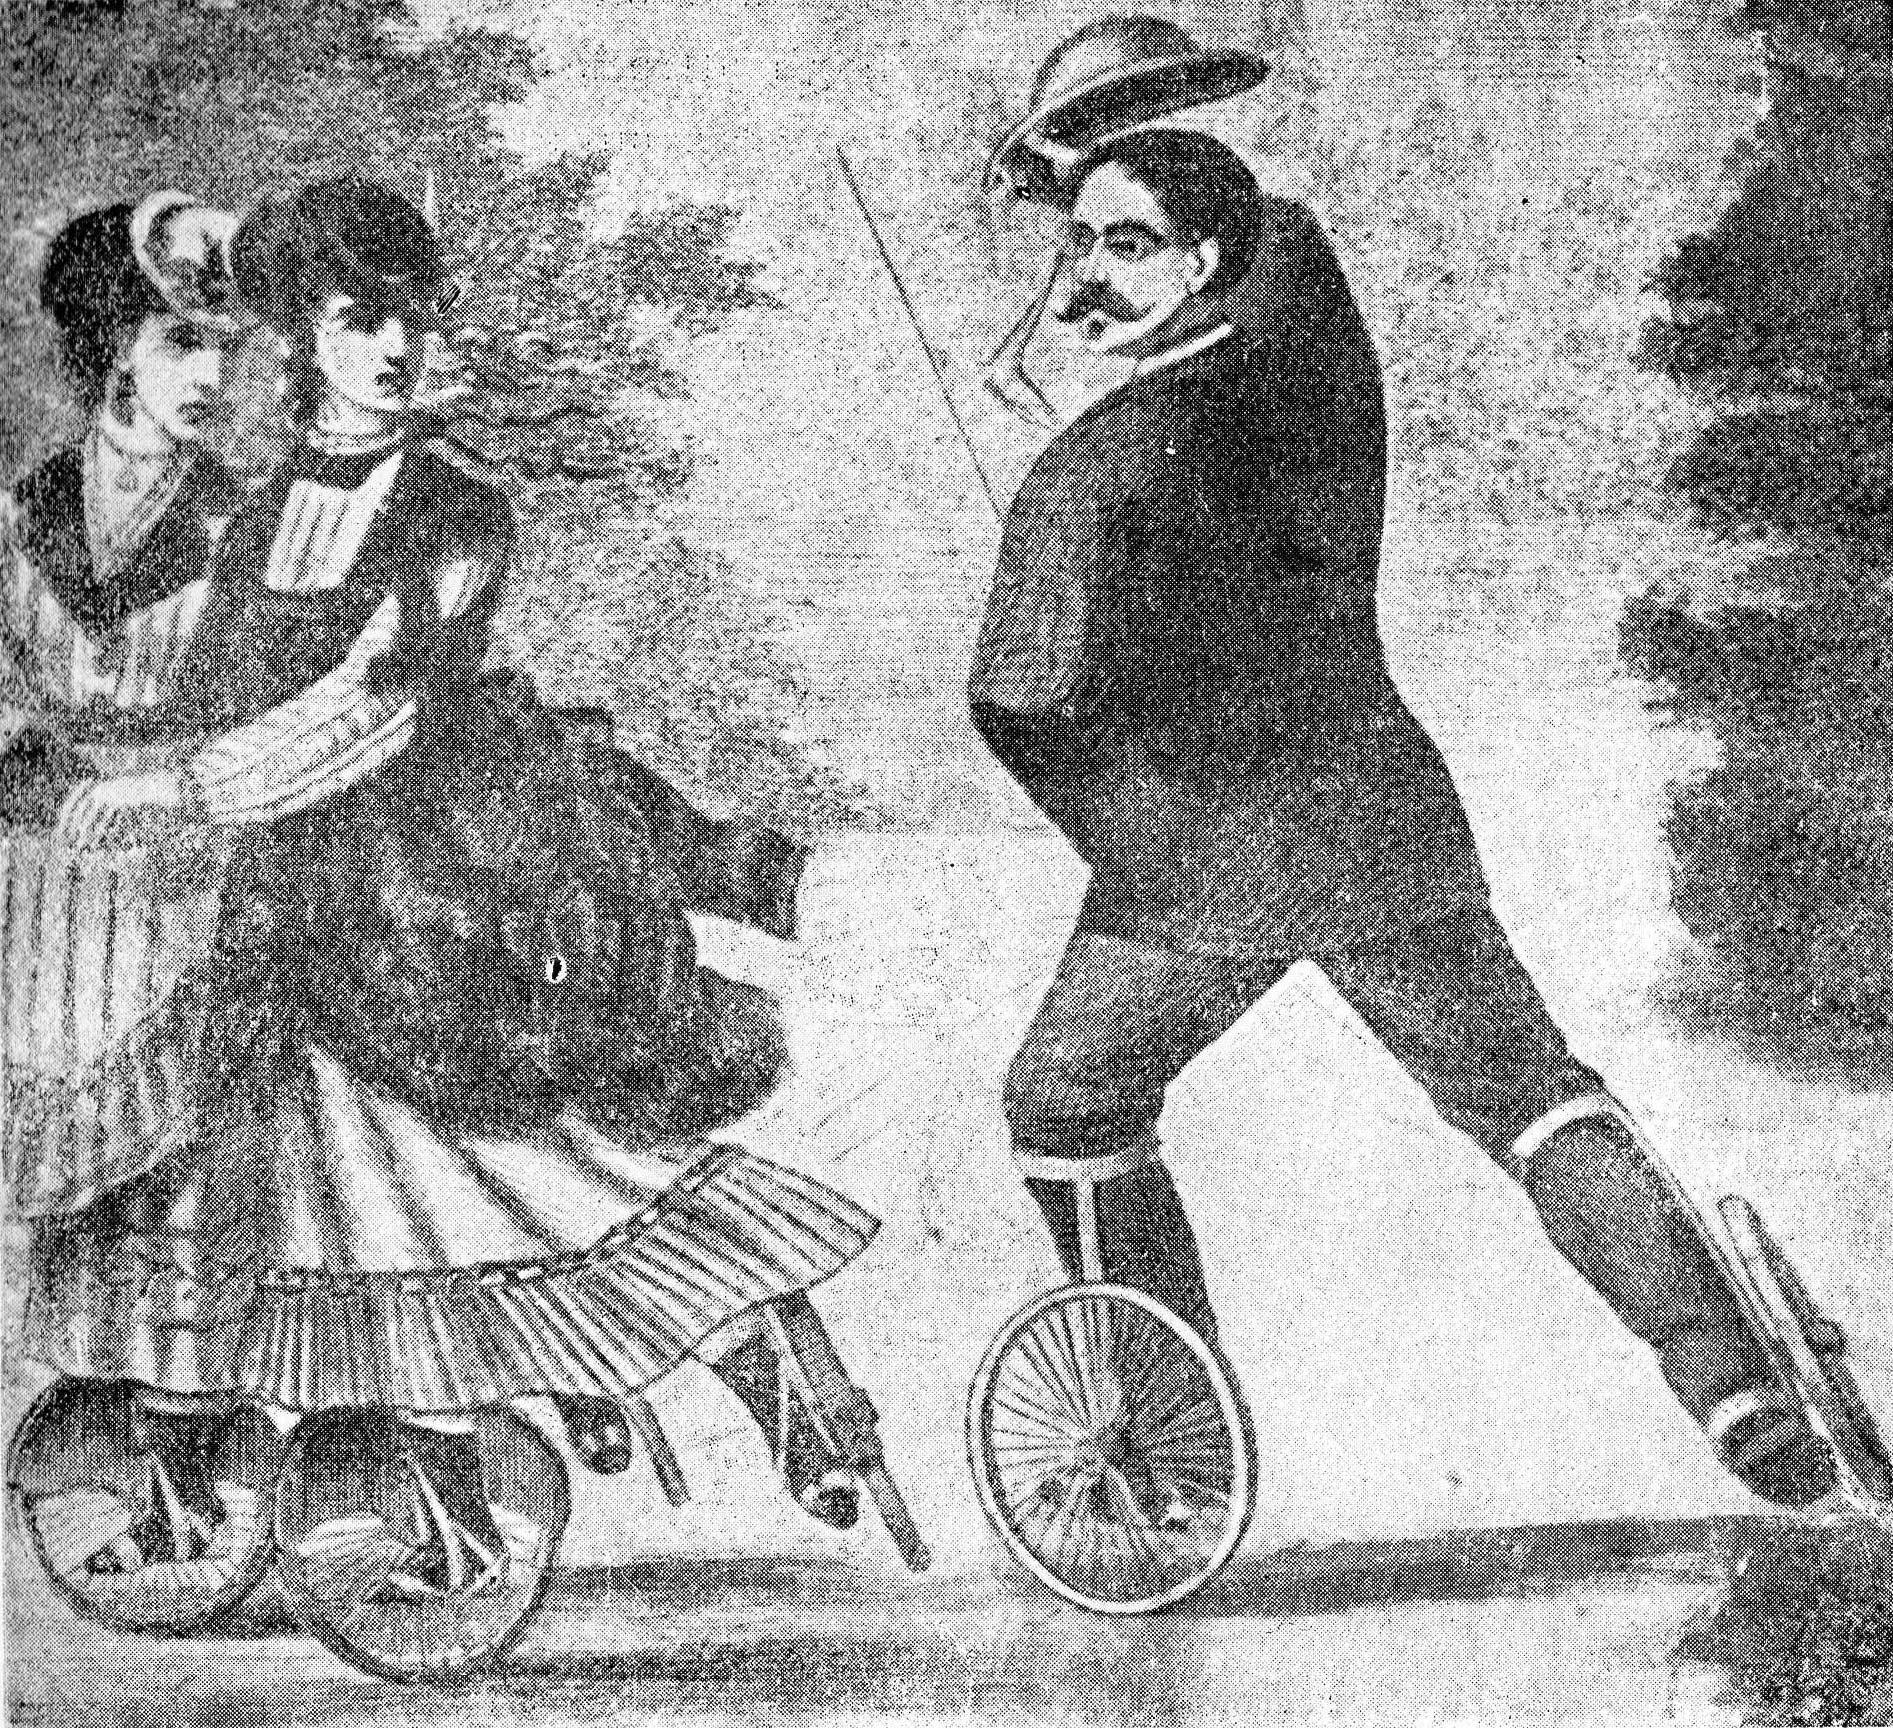 Figura 2 - Pattinatori Bois de Boulogne 1837